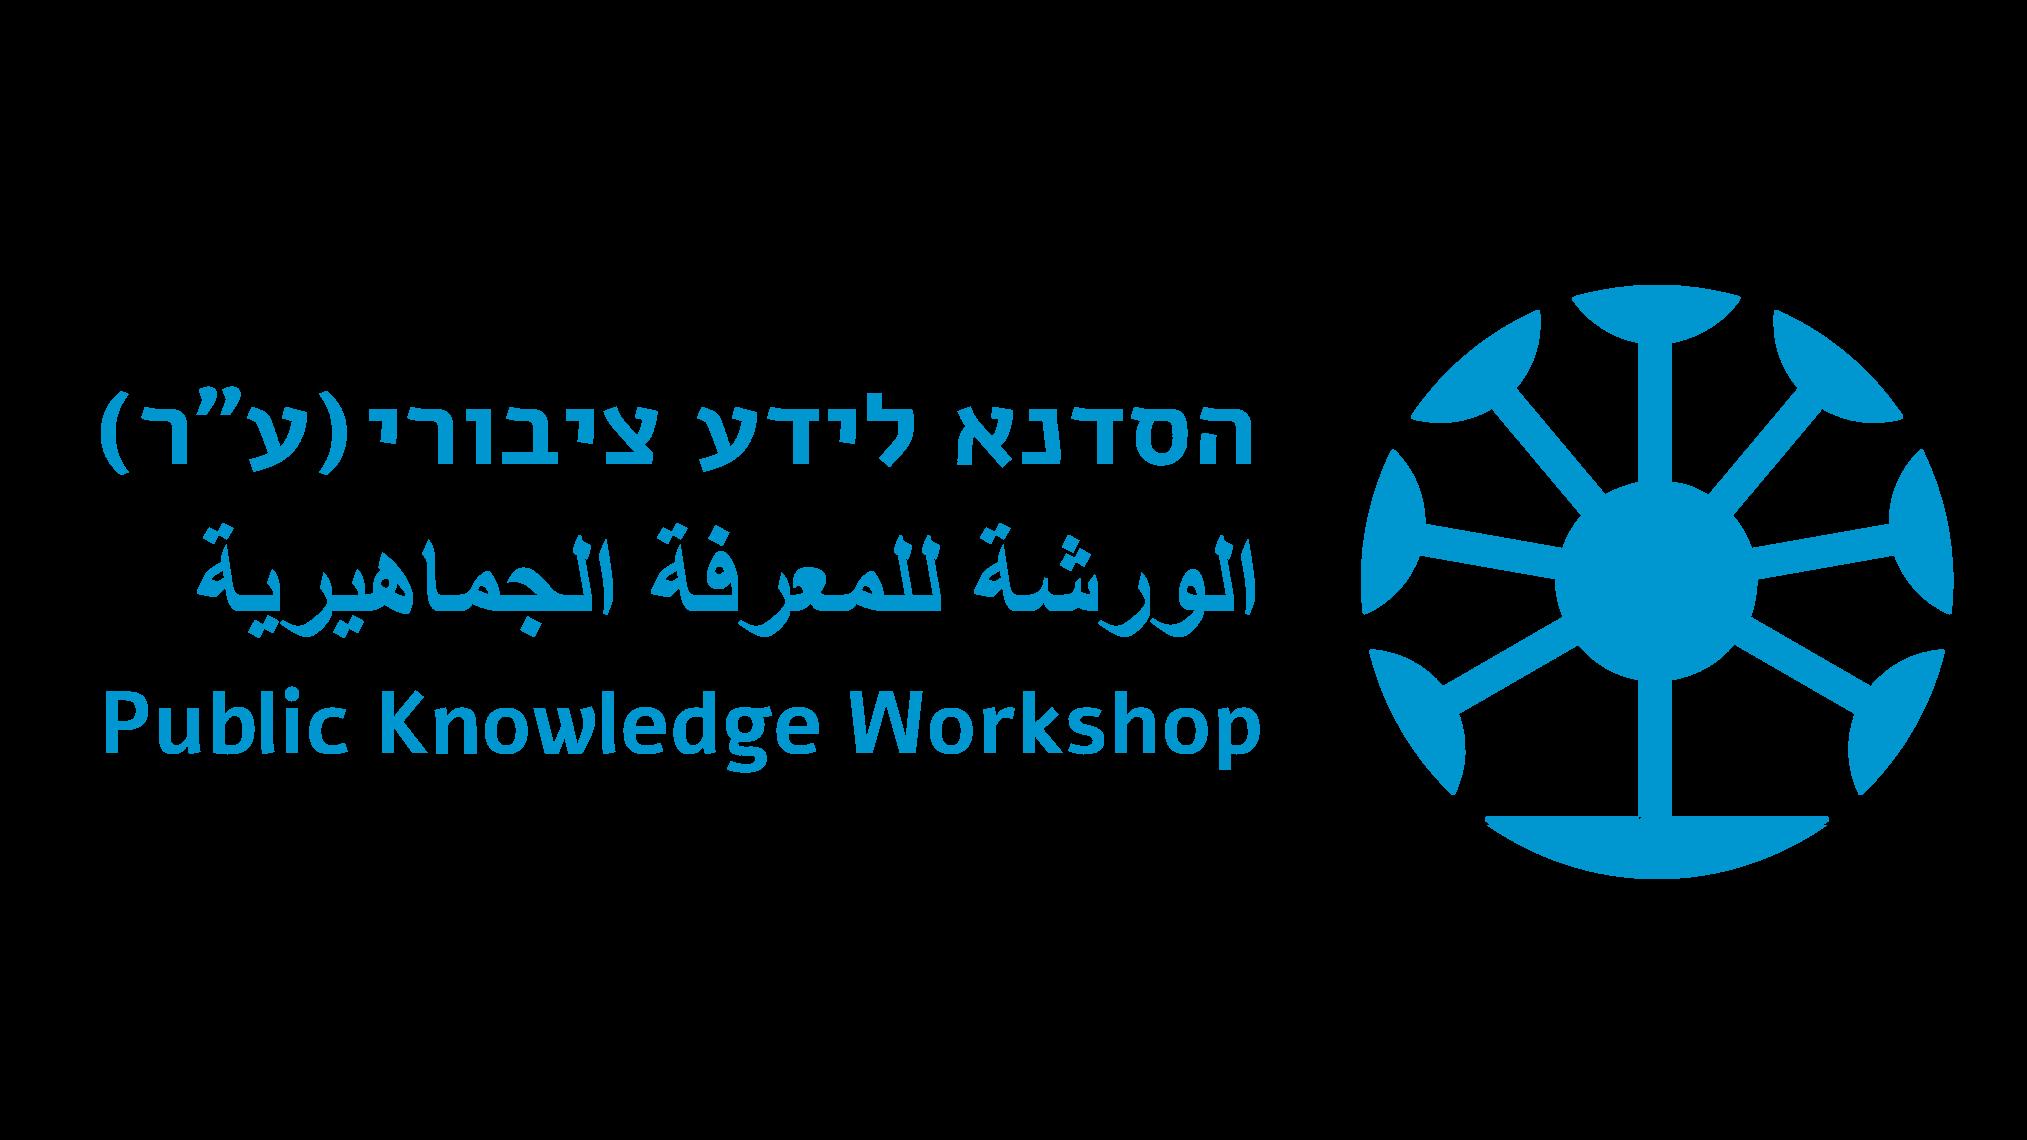 The Public Knowledge Workshop